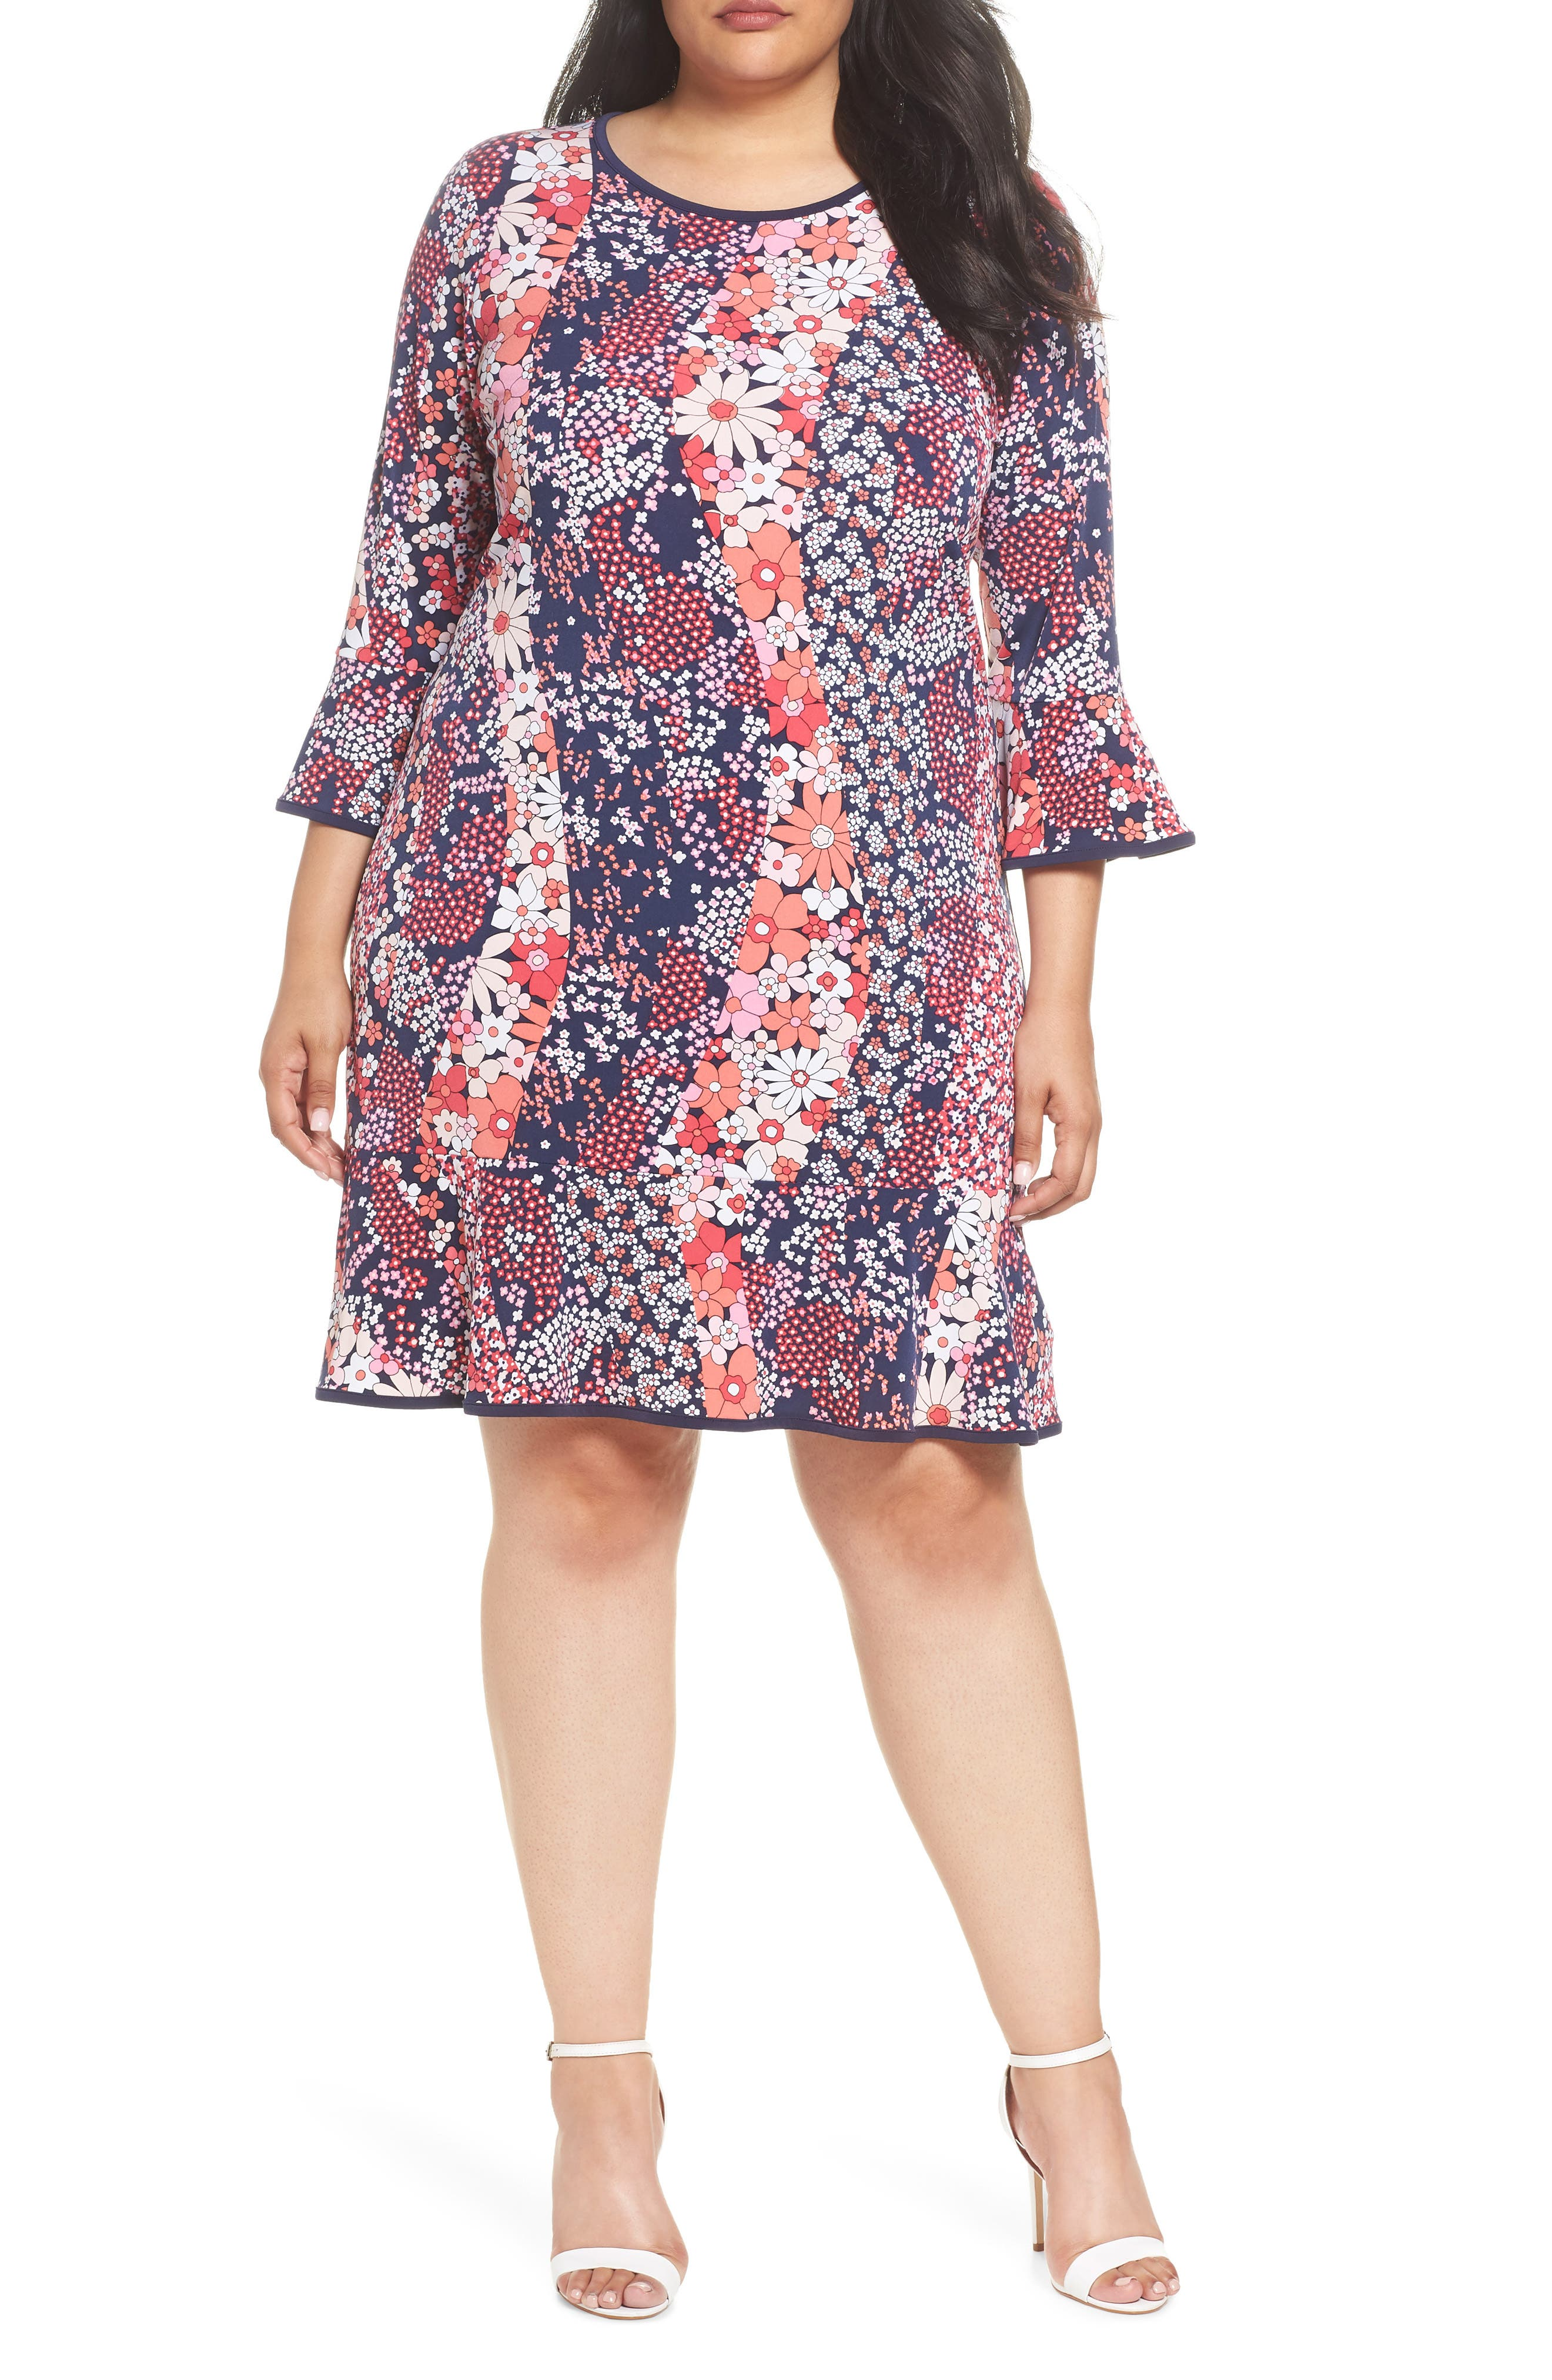 MICHAEL MICHAEL KORS Patchwork Floral Bell Sleeve Shift Dress, Main, color, 679